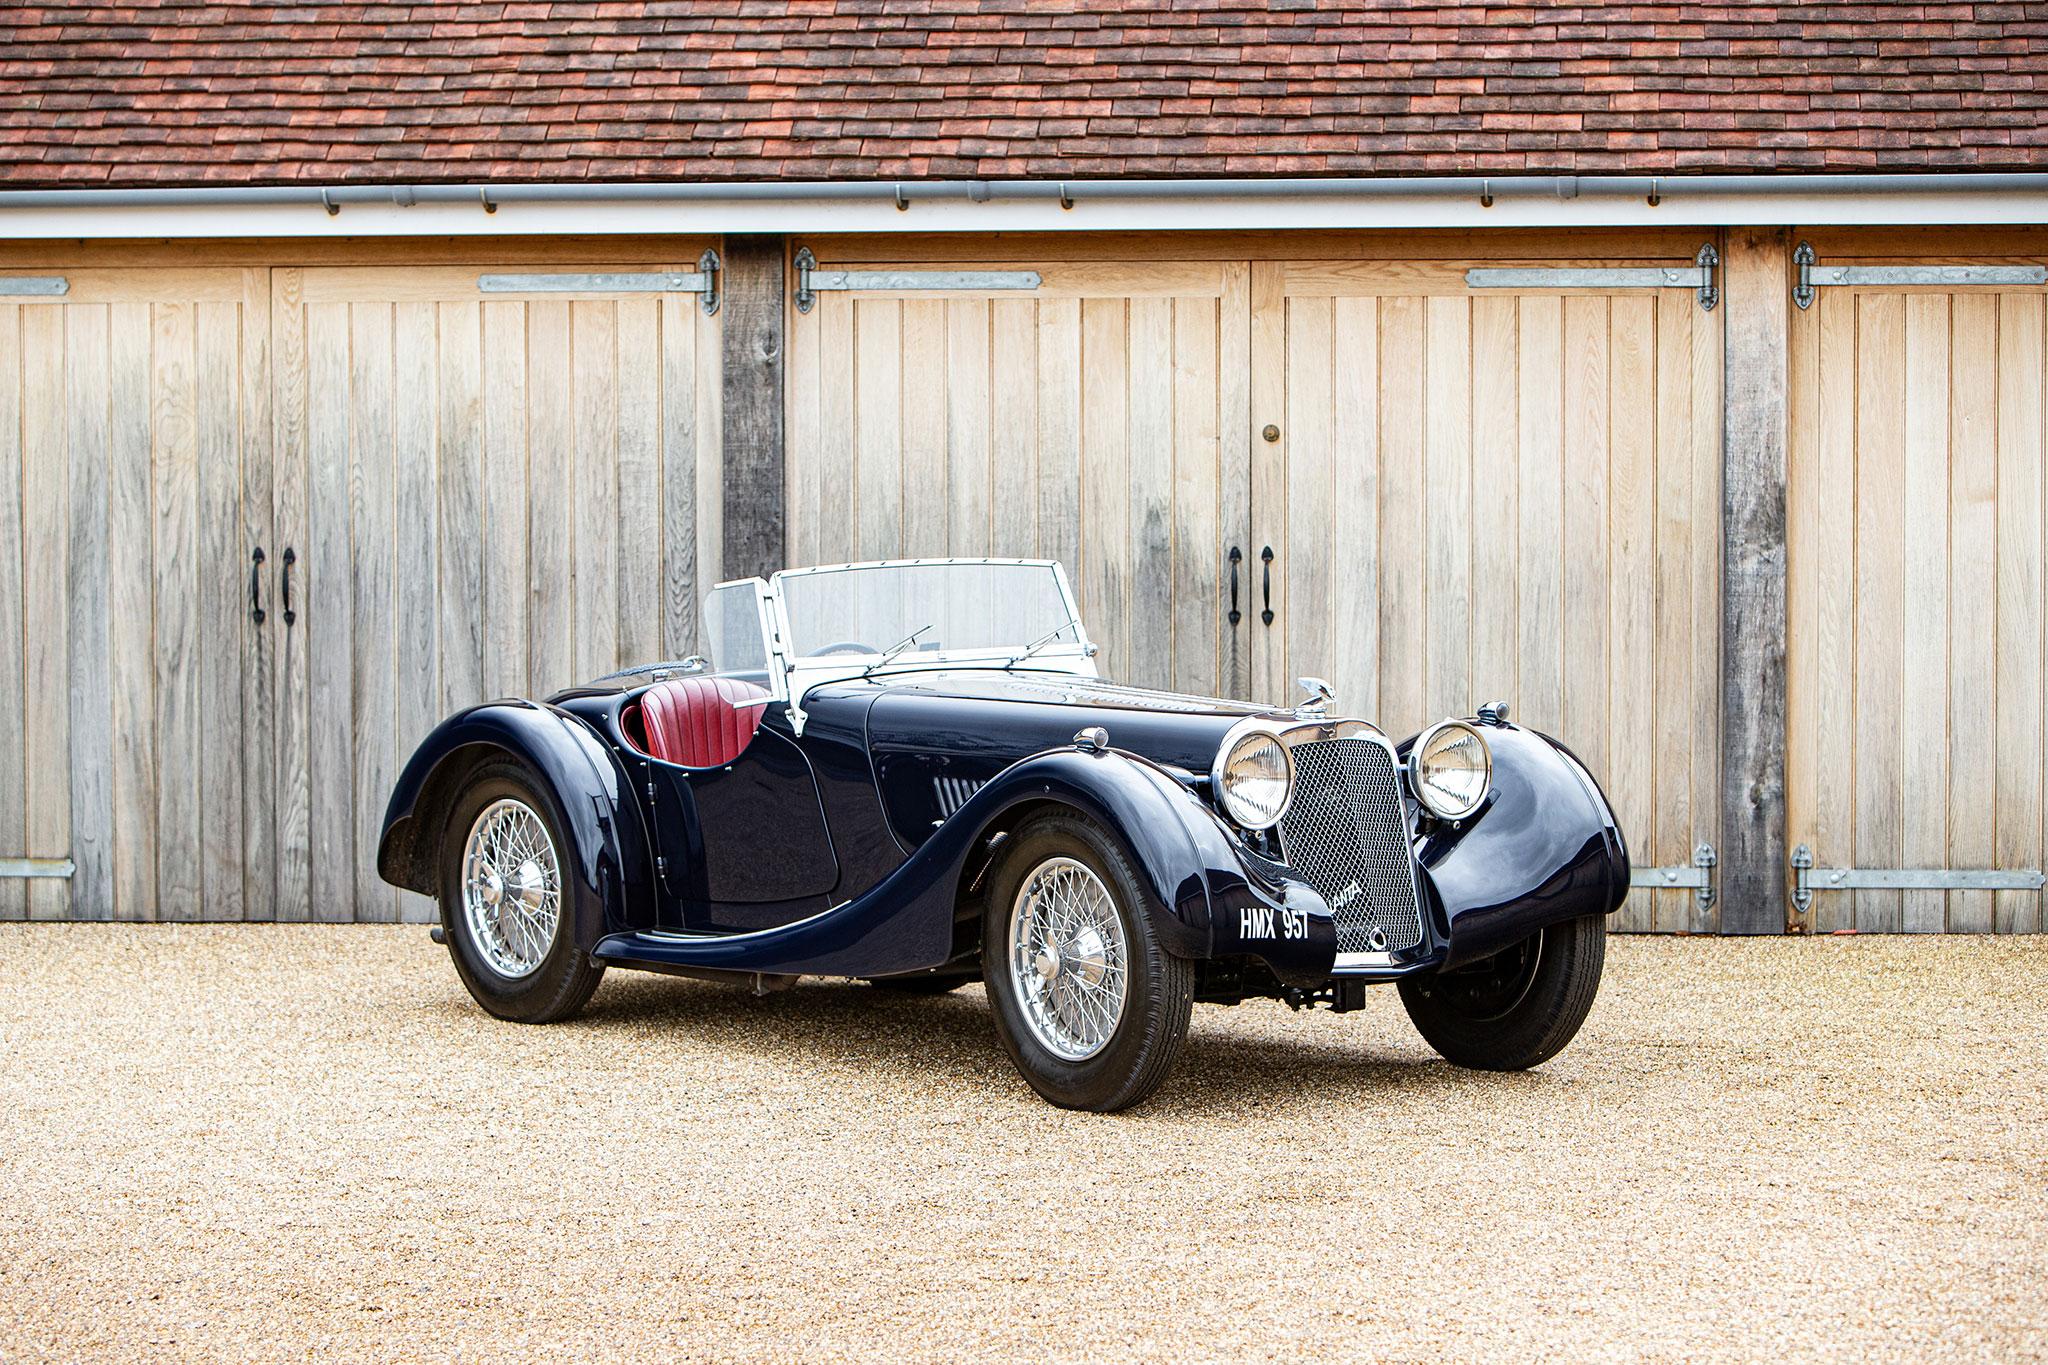 1937 Atalanta 2-Litre Sports 1939 Ex Midge Wilby Scottish RAC Rally - Bonhams Bond Street Sale